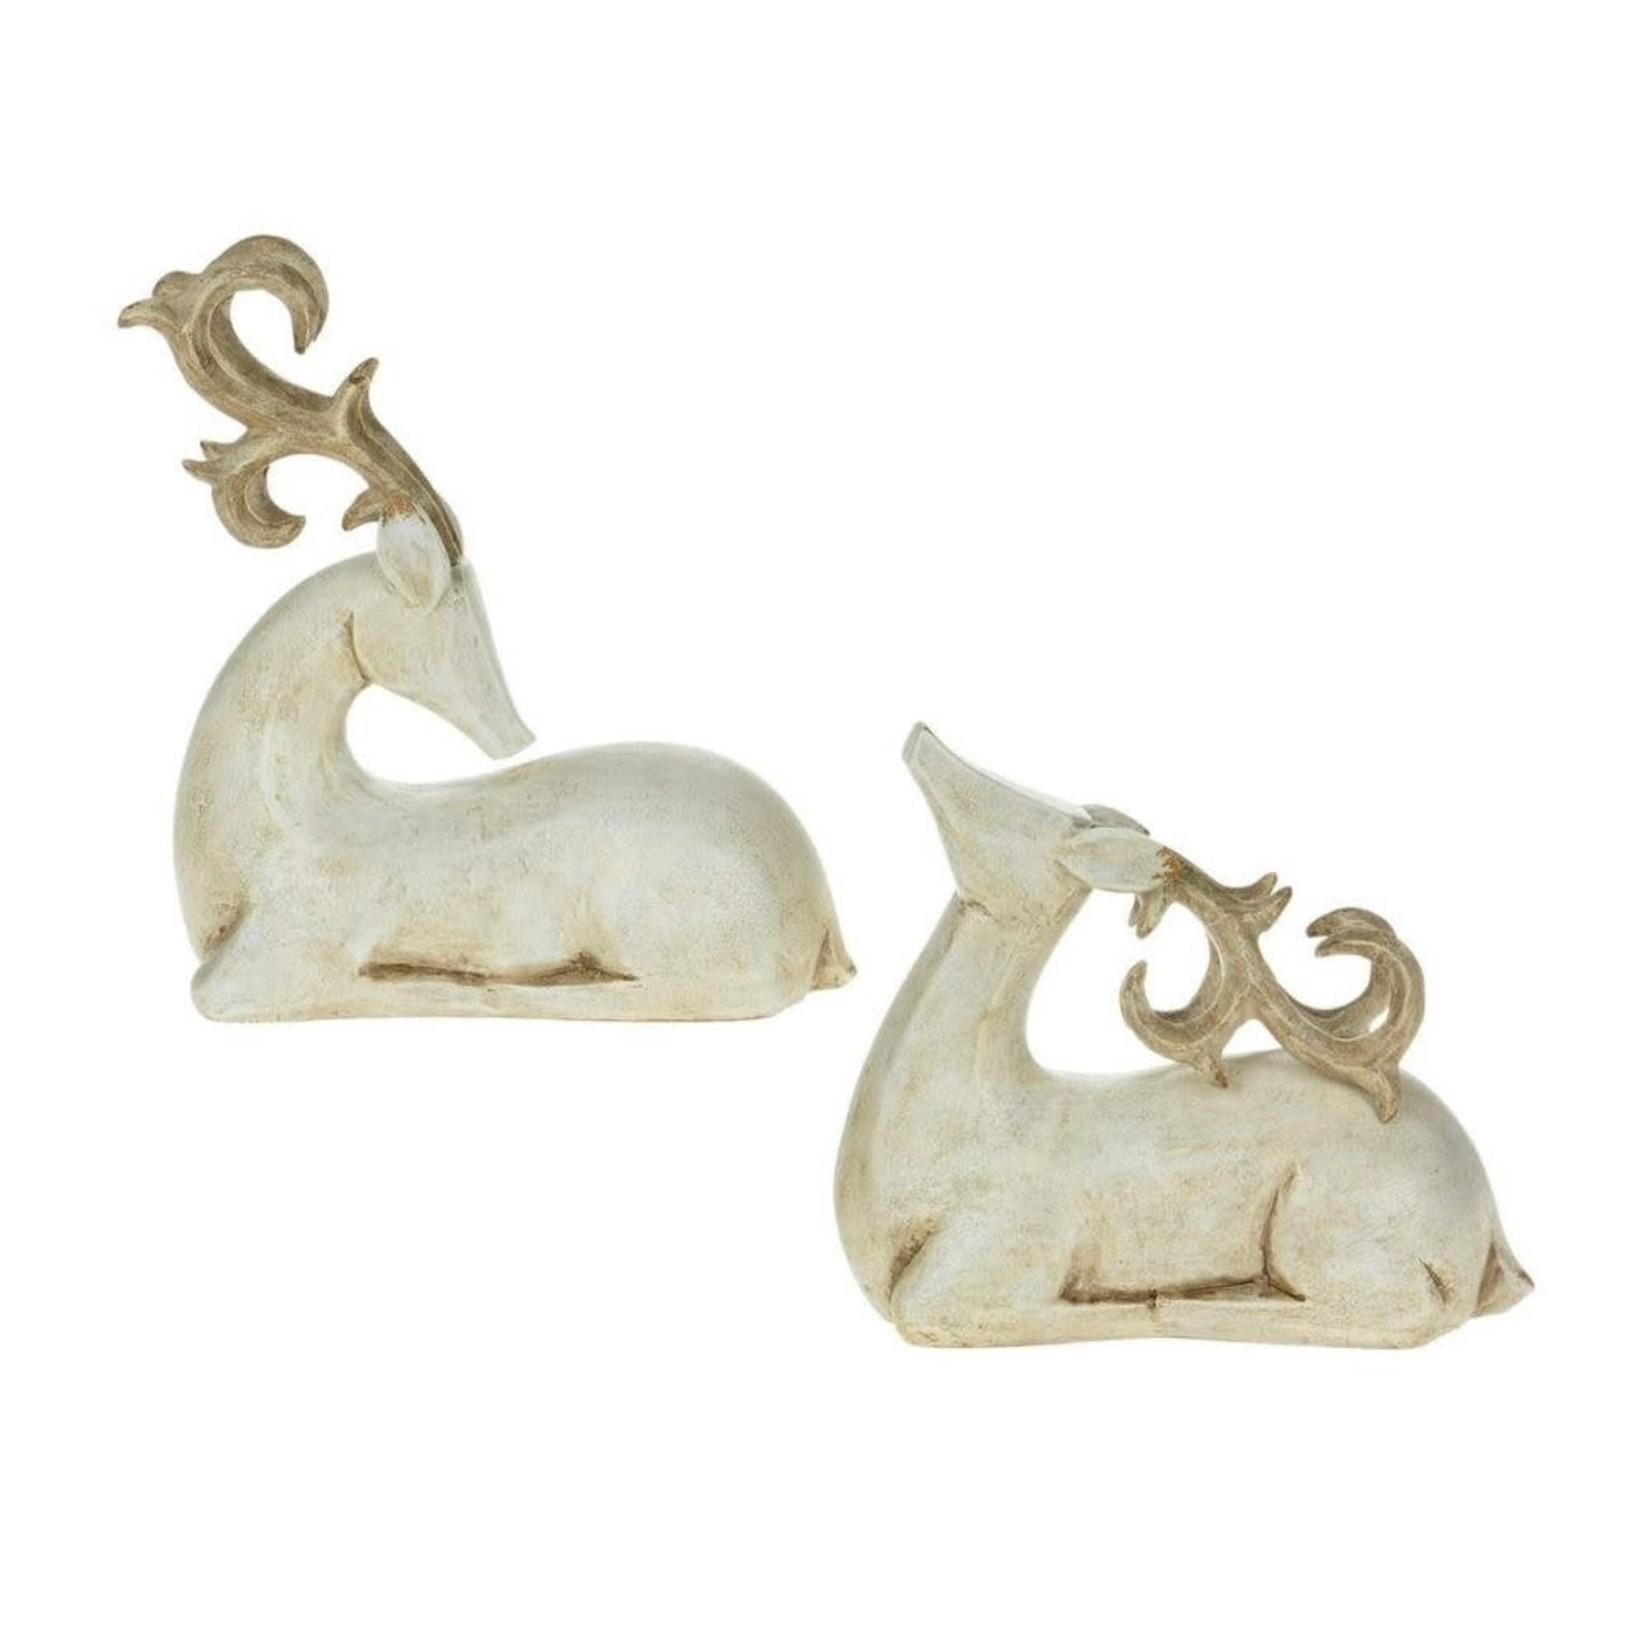 Antique White Resting Deer